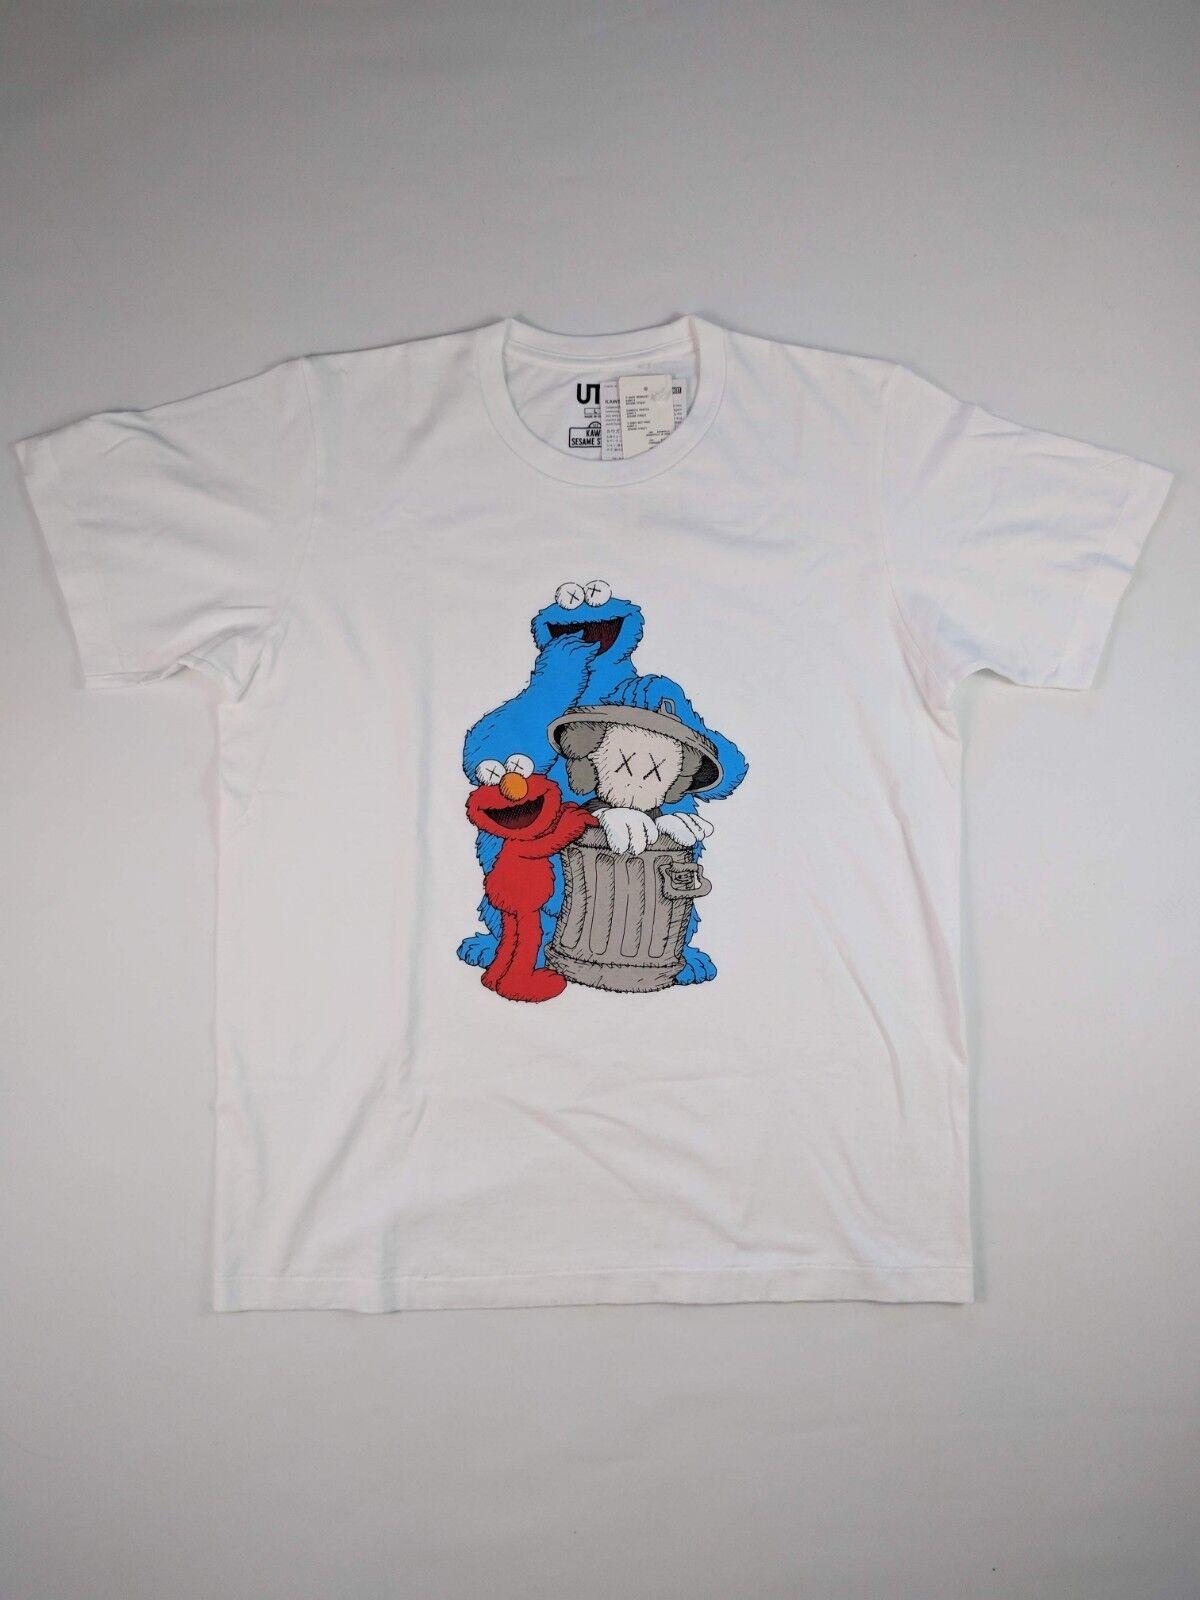 Kaws Sesame Street T-hemd Weiß XS